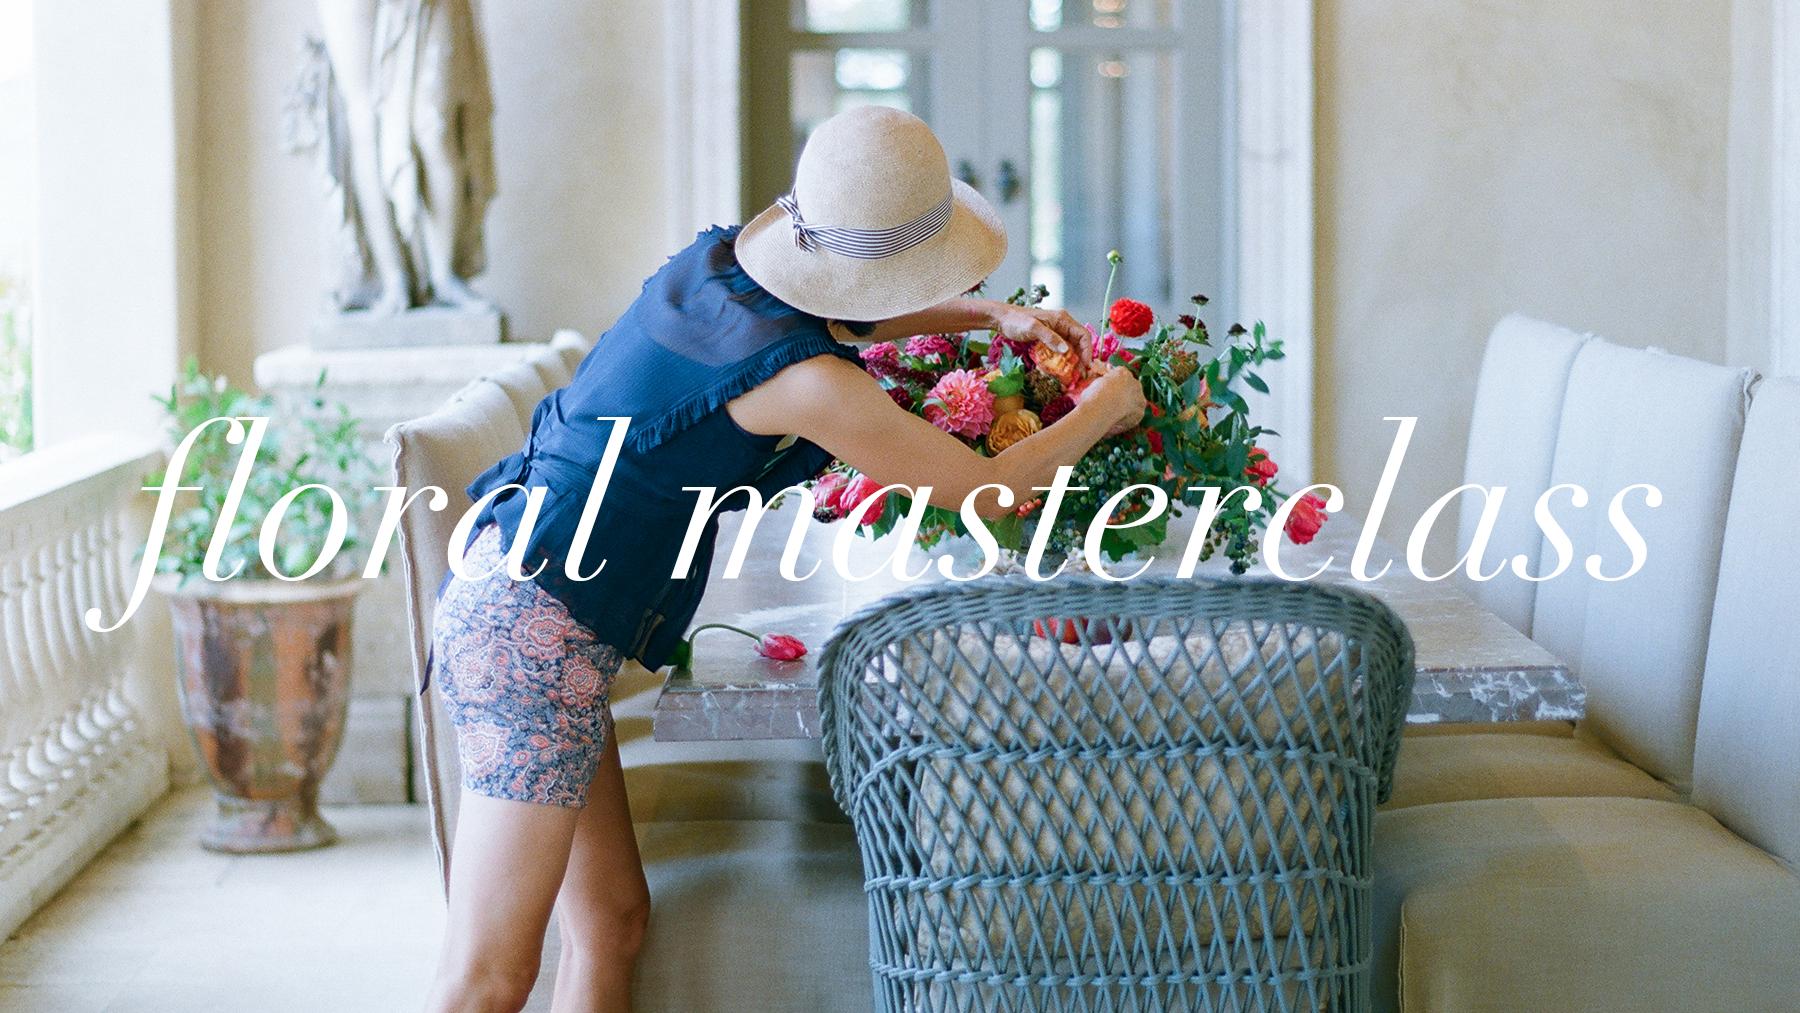 isari-flower-studio-floral-masterclass-san-diego-1.png